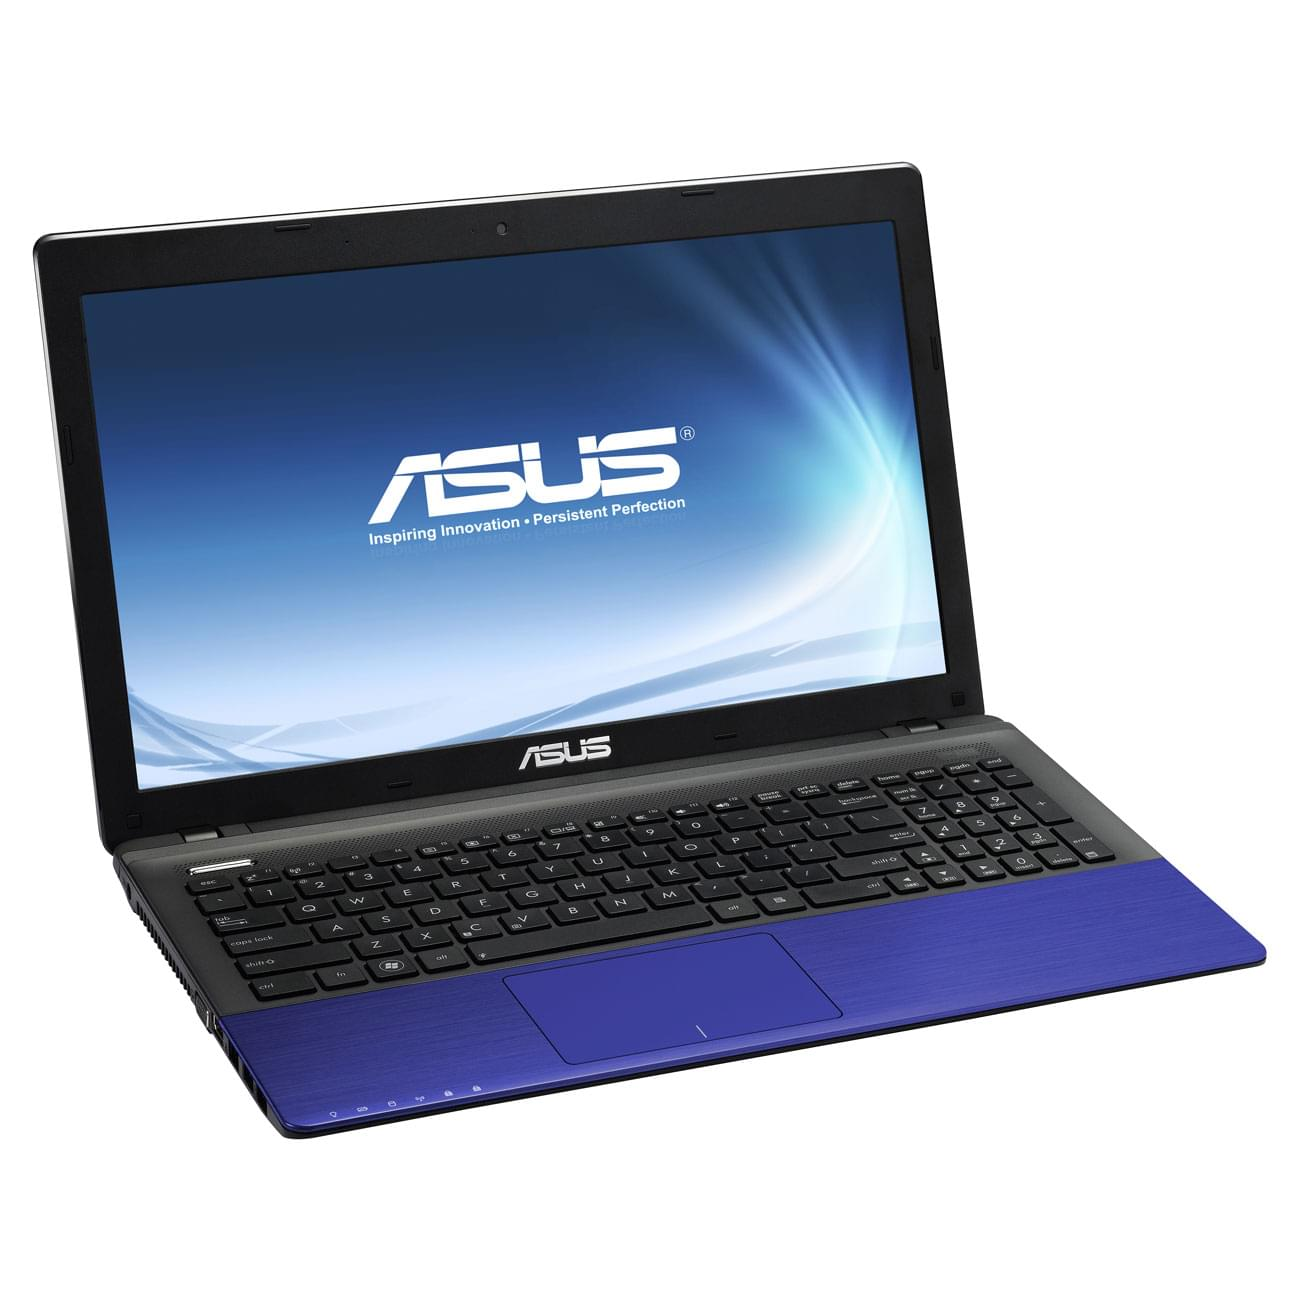 Asus K55VD-SX202V Bleu (K55VD-SX202V) - Achat / Vente PC portable sur Cybertek.fr - 0